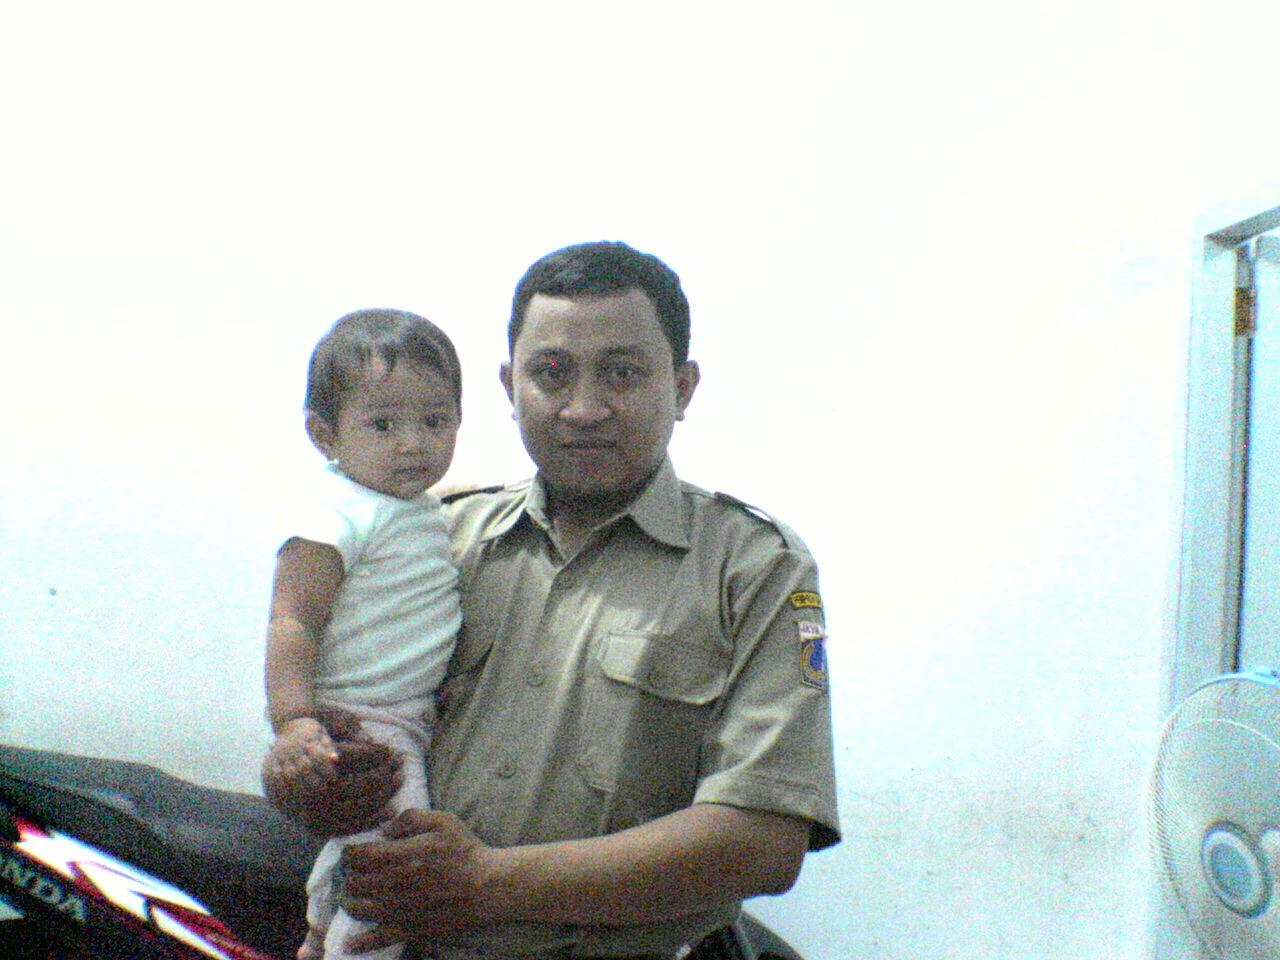 bersama anakku ratu